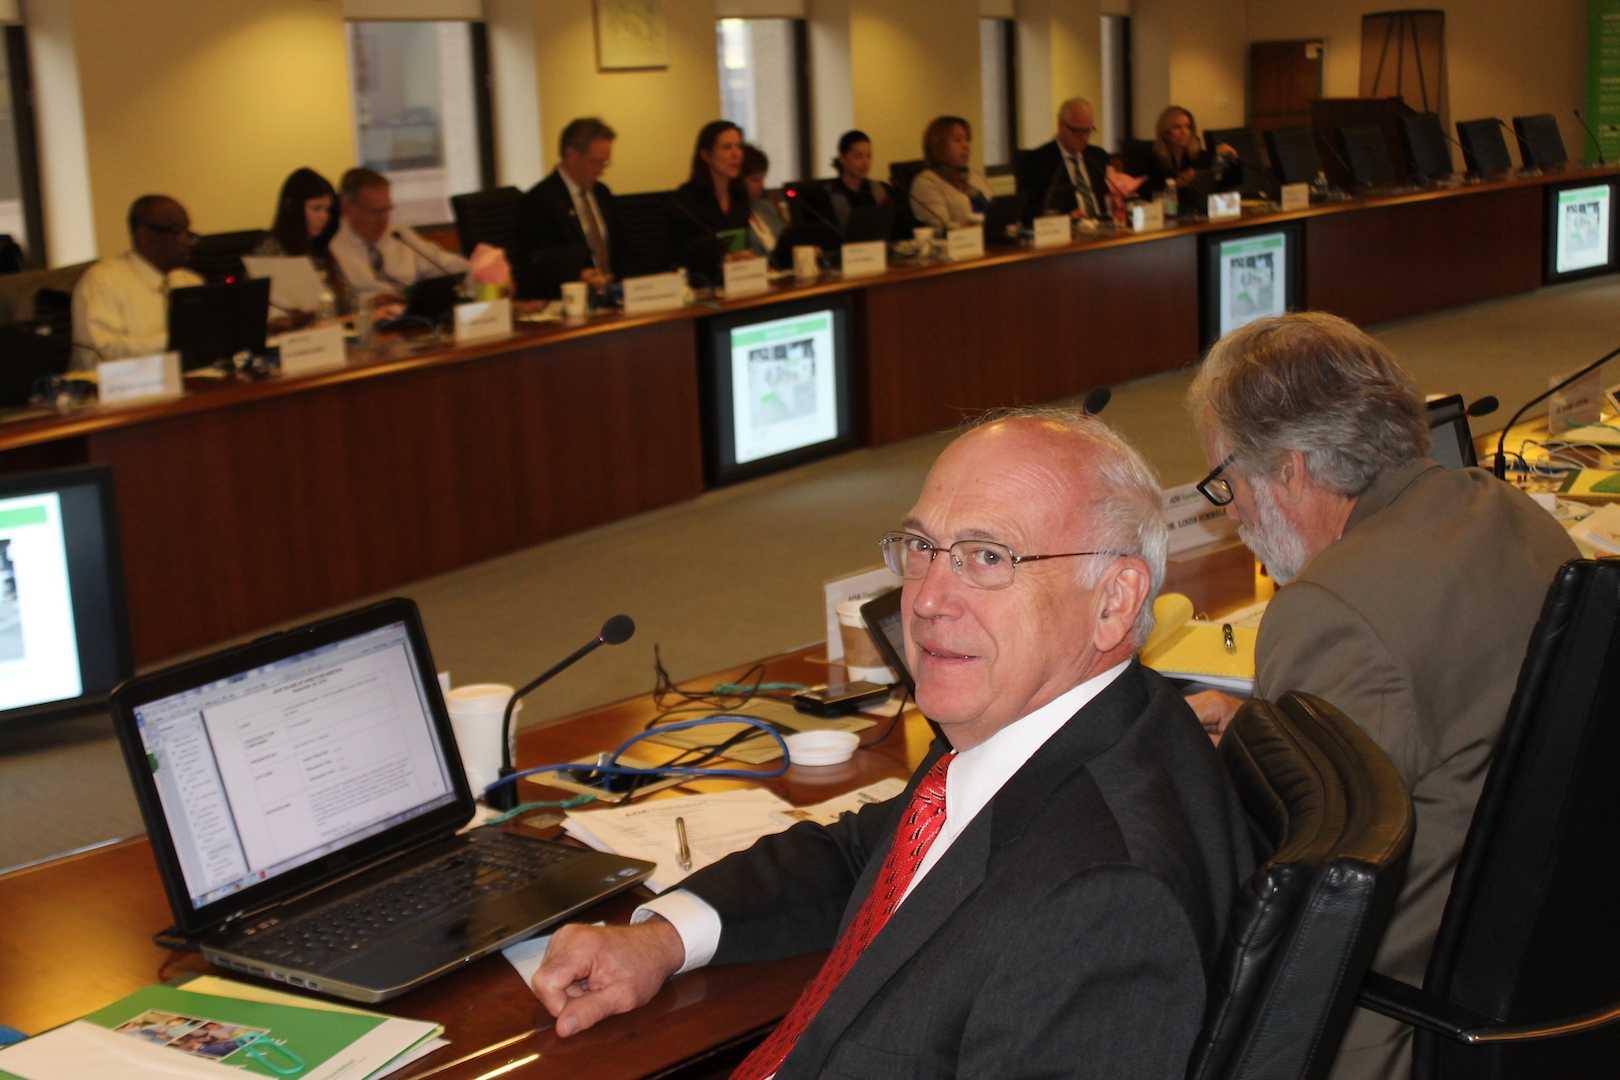 Dr. Bill Calnon, President and Interim Executive Director, ADA Foundation